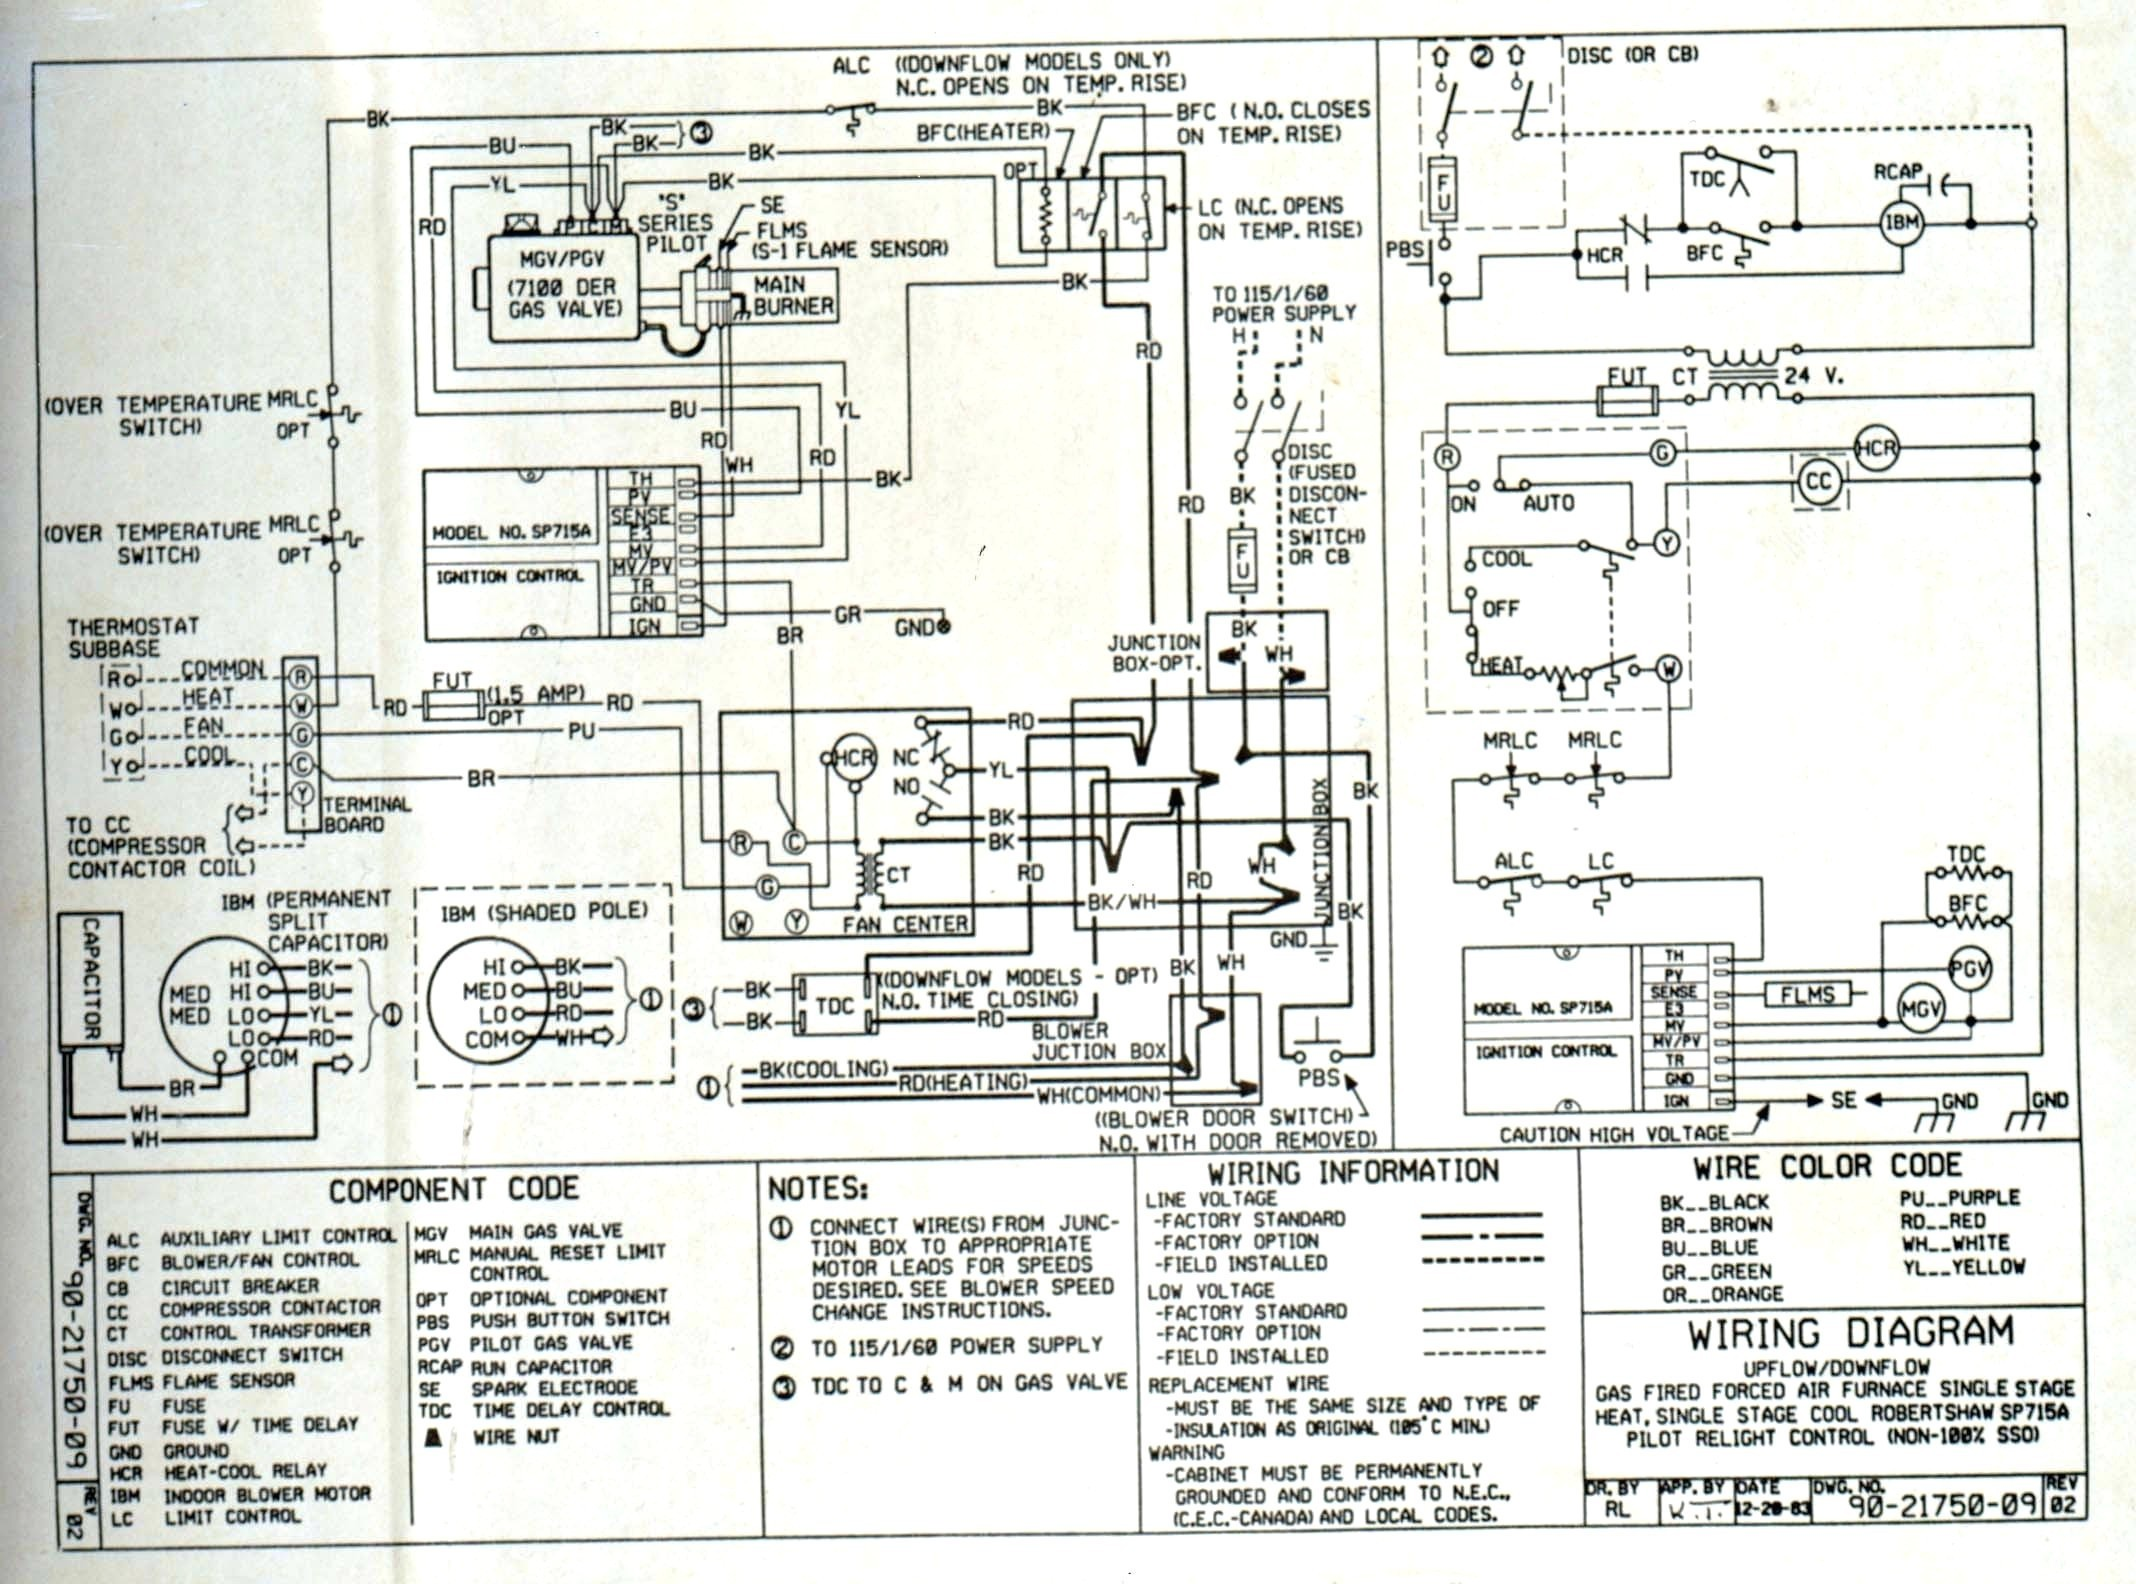 Car Fuse Box Diagram York Heat Pump Fuse Box Experts Wiring Diagram • Of Car Fuse Box Diagram